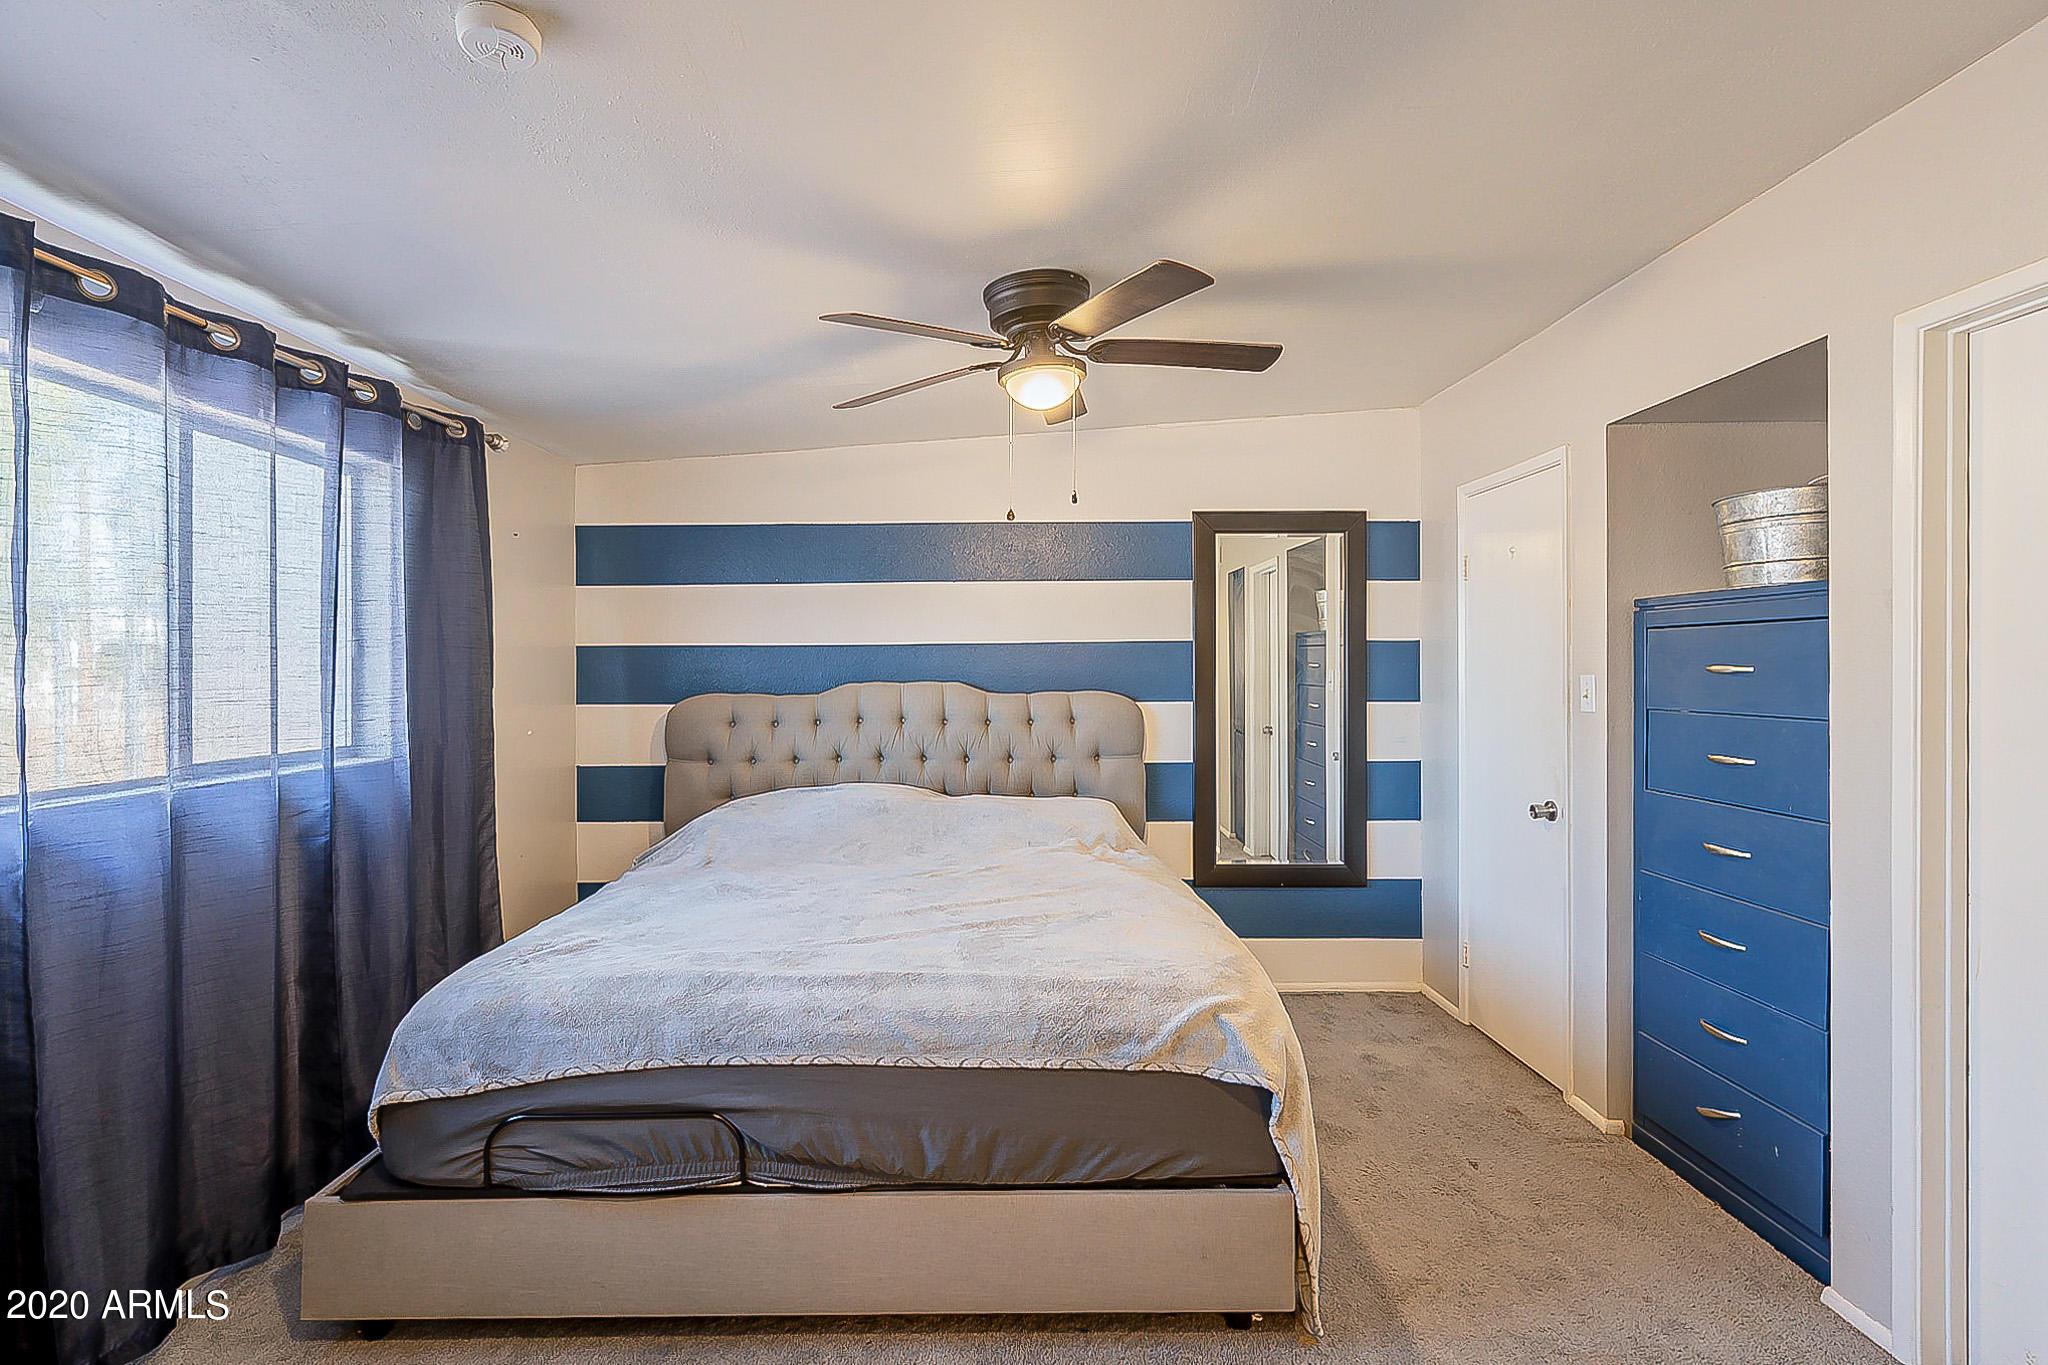 714 W ROOSEVELT Avenue, Coolidge, Arizona 85128, 3 Bedrooms Bedrooms, ,2 BathroomsBathrooms,Single Family,For Sale,714 W ROOSEVELT Avenue,1,6172849